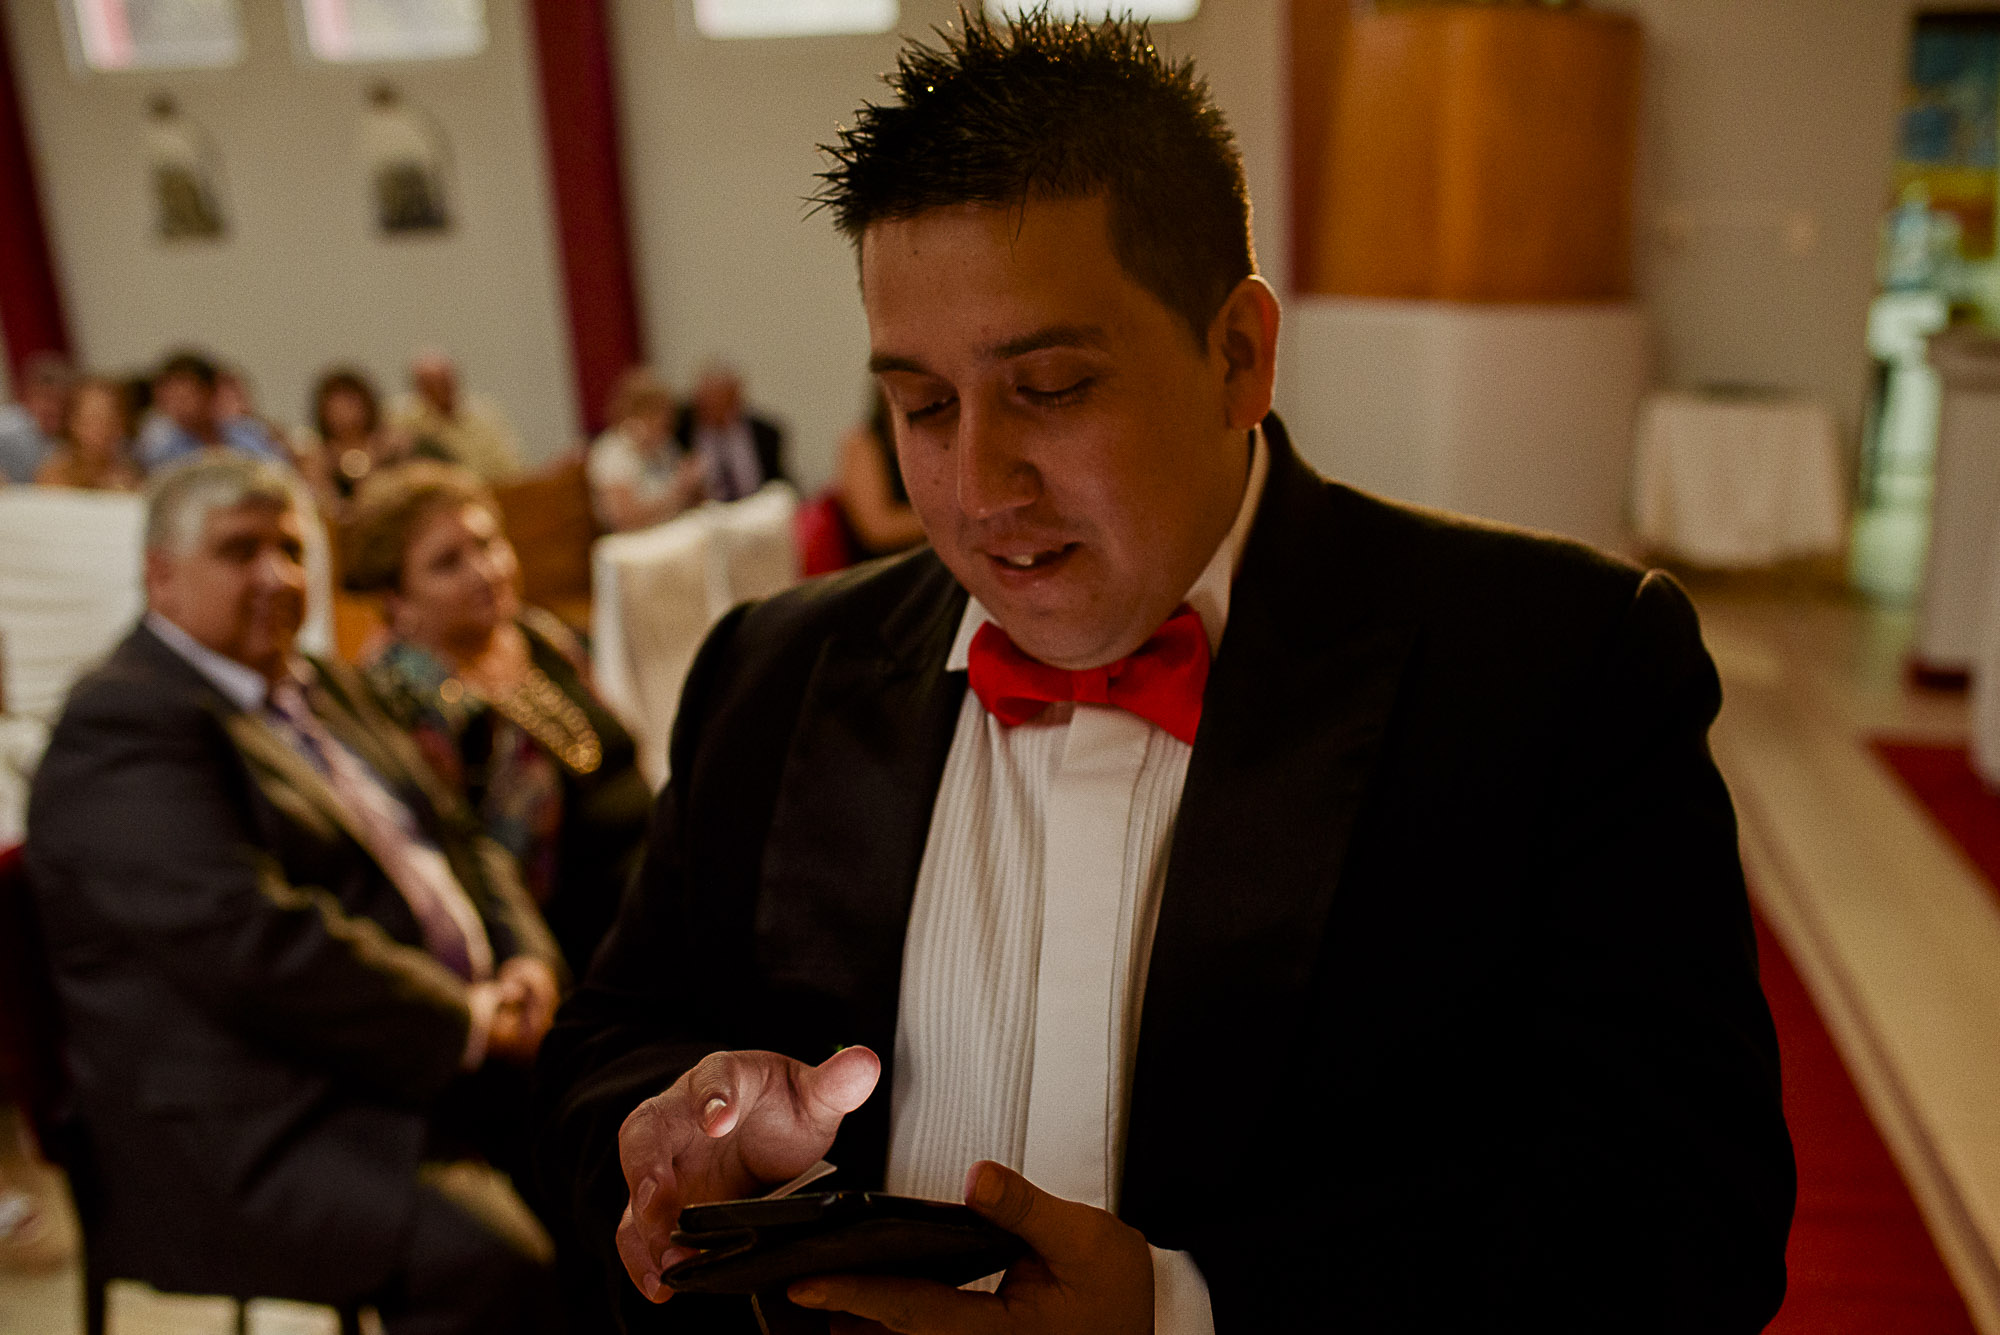 boda-vero-raul-patagonia-argentina-chilena-fotografo-de-bodas-argentina-casamiento-en-patagonia-gabriel-roa-photography-9